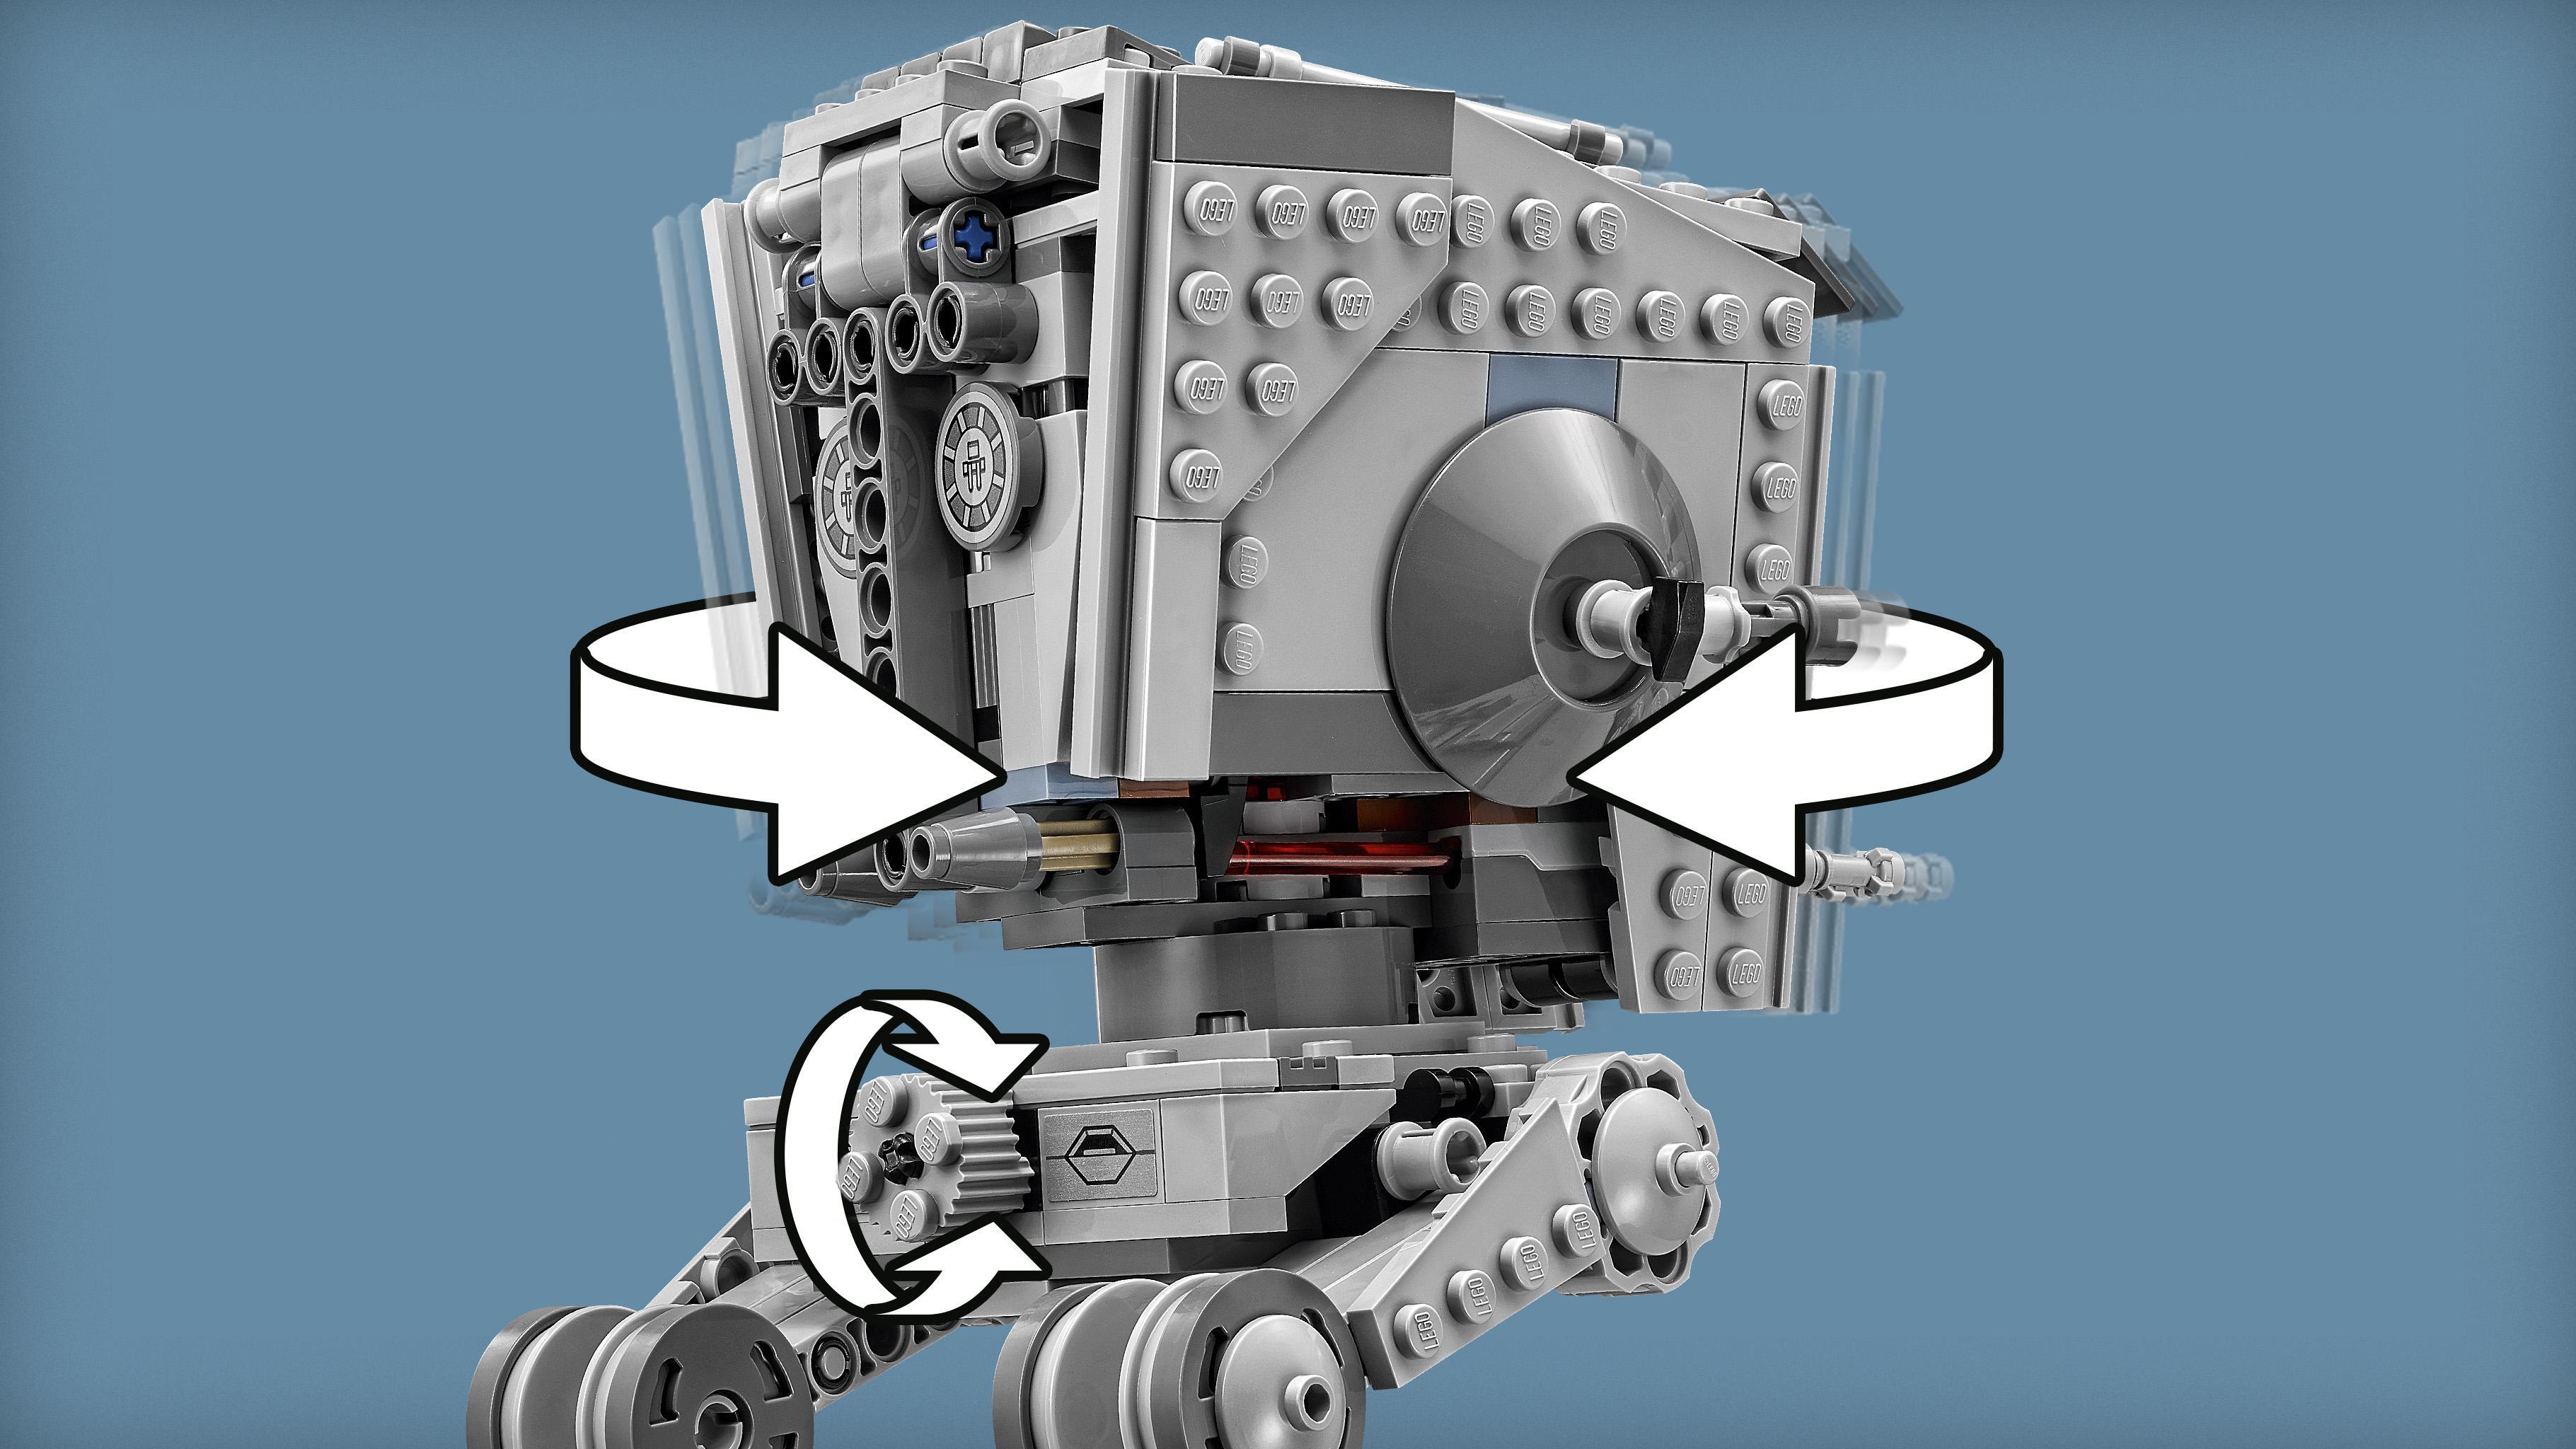 Lego star wars at st walker 75153 toys games - Lego star warse ...